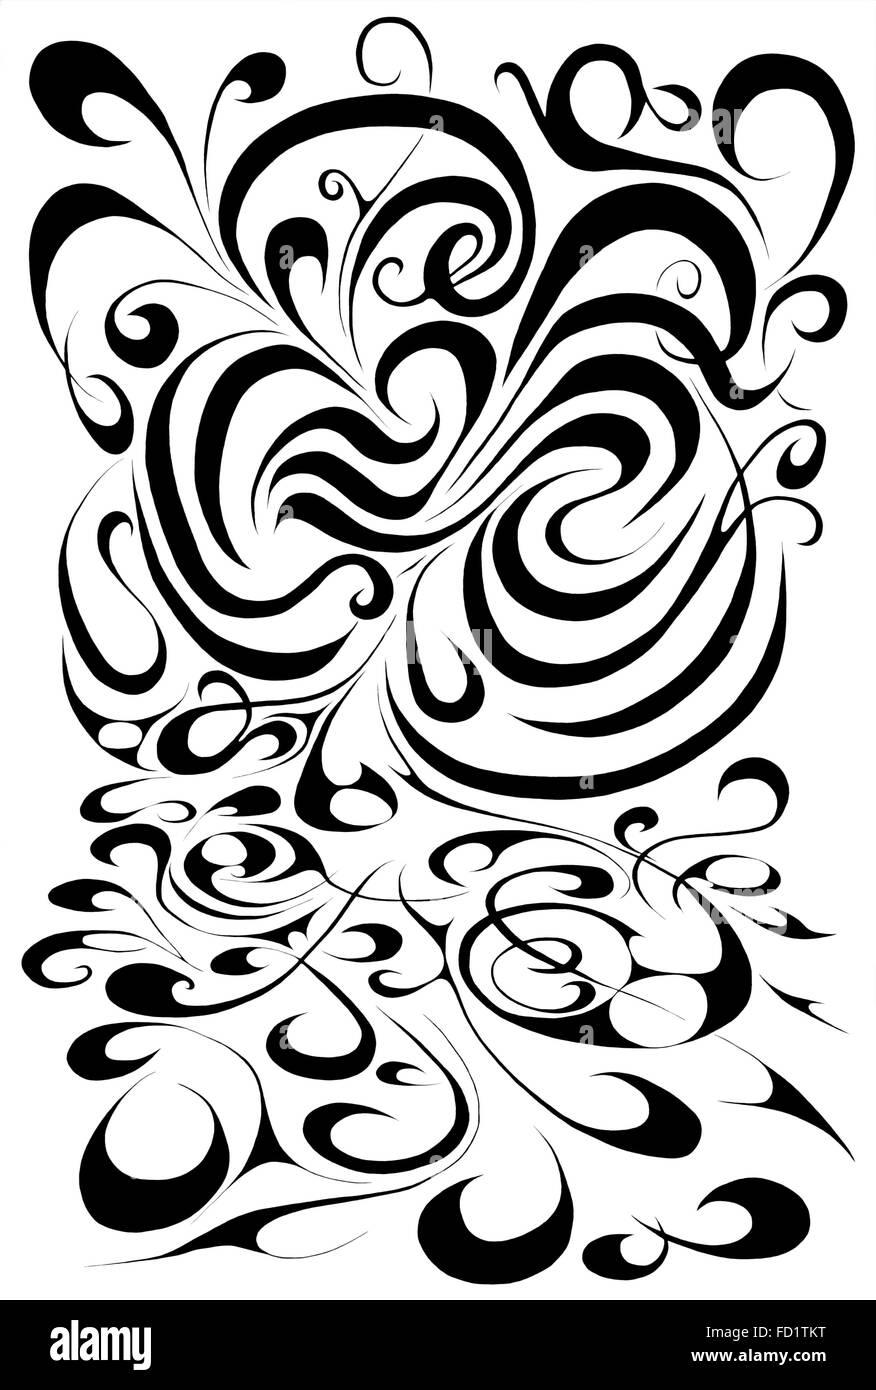 Gigante, swirly, Black & White doodle Immagini Stock